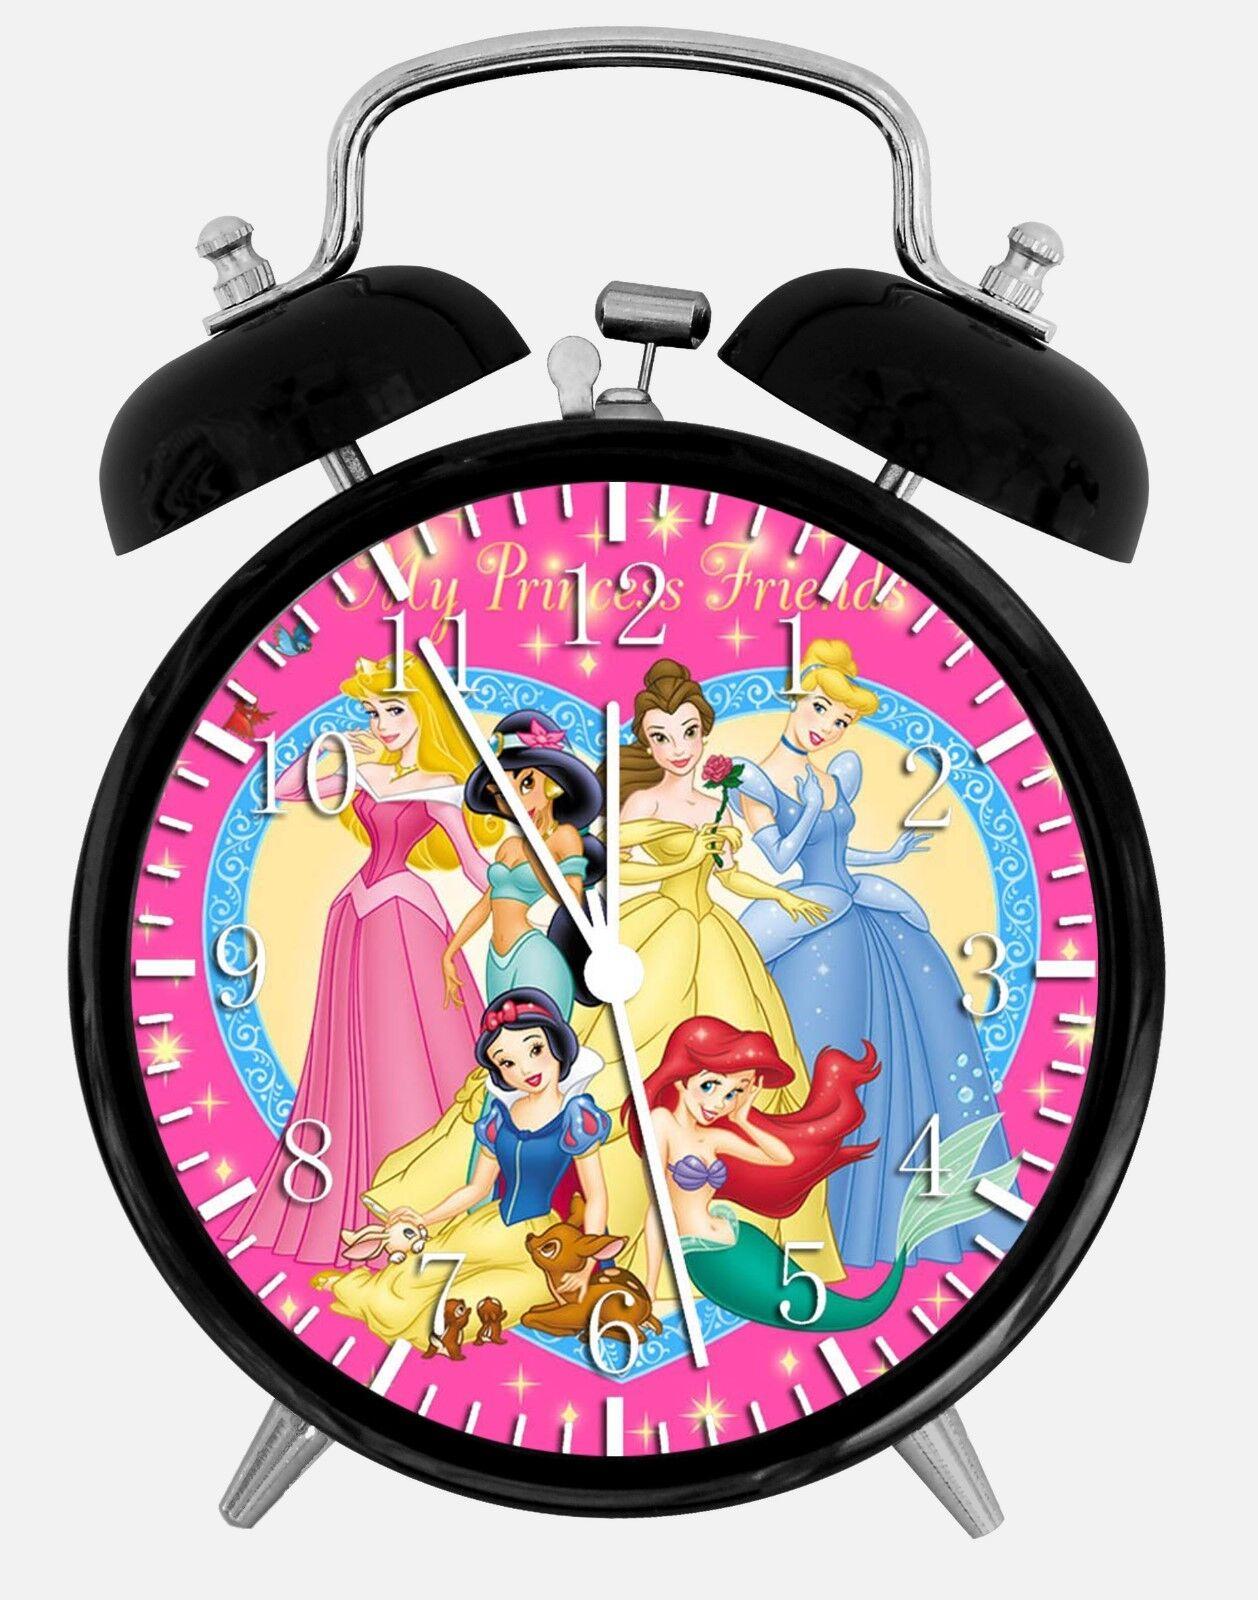 "Disney Princess Alarm Desk Clock 3.75"" Home or Office Decor W70 Nice For Gift"